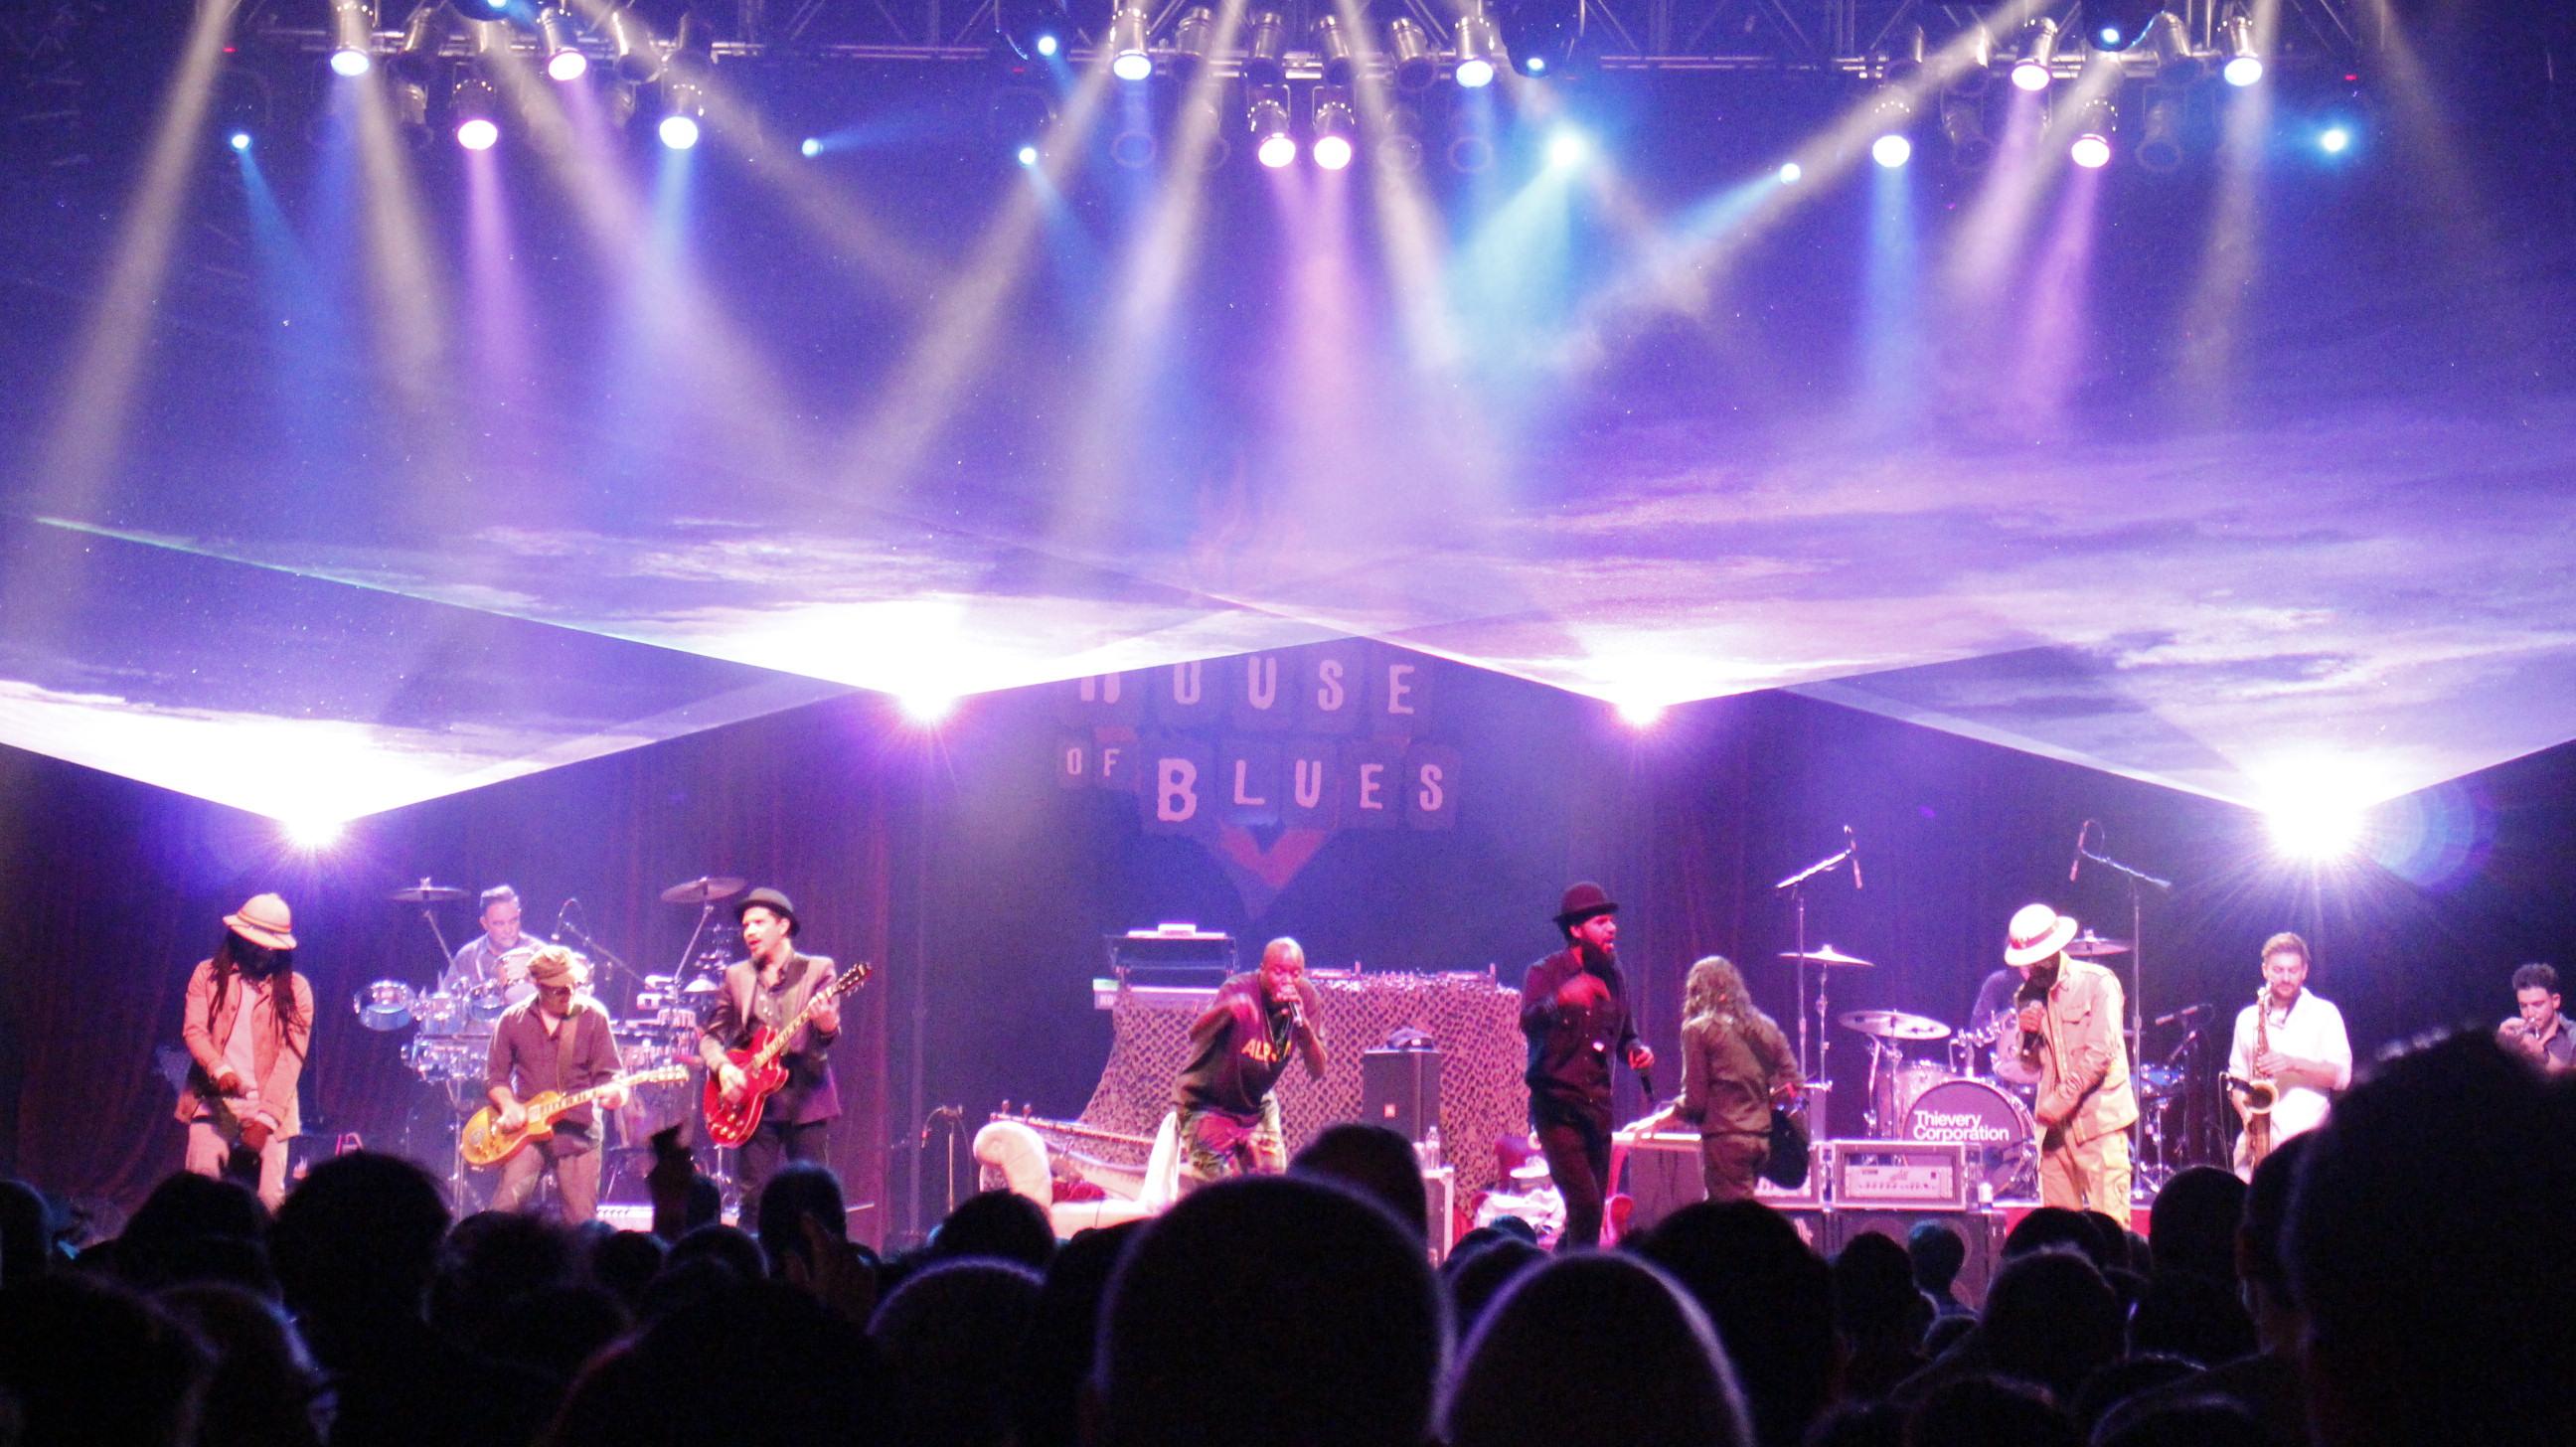 House of Blues Houston, TX Concert Laser